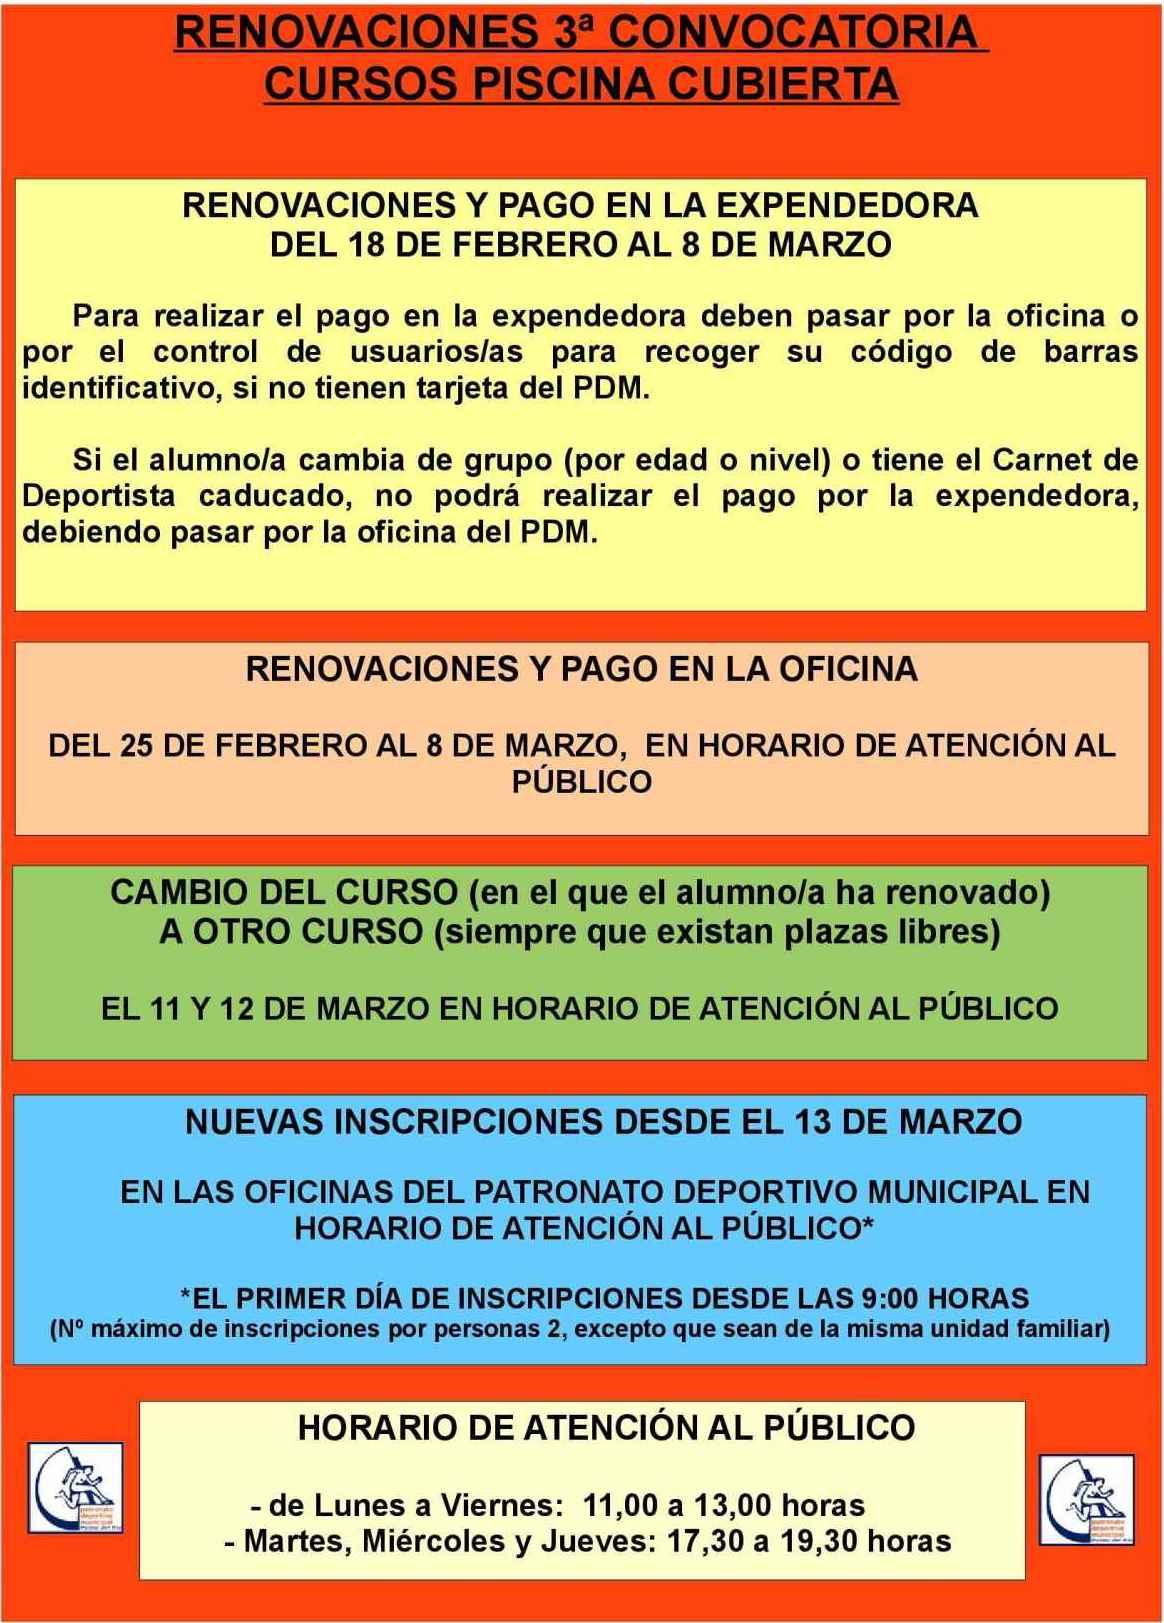 https://www.palmadelrio.es/sites/default/files/renovaciones_expendedora_temporalizacion_3a_convocatoria_18-19-002.jpg